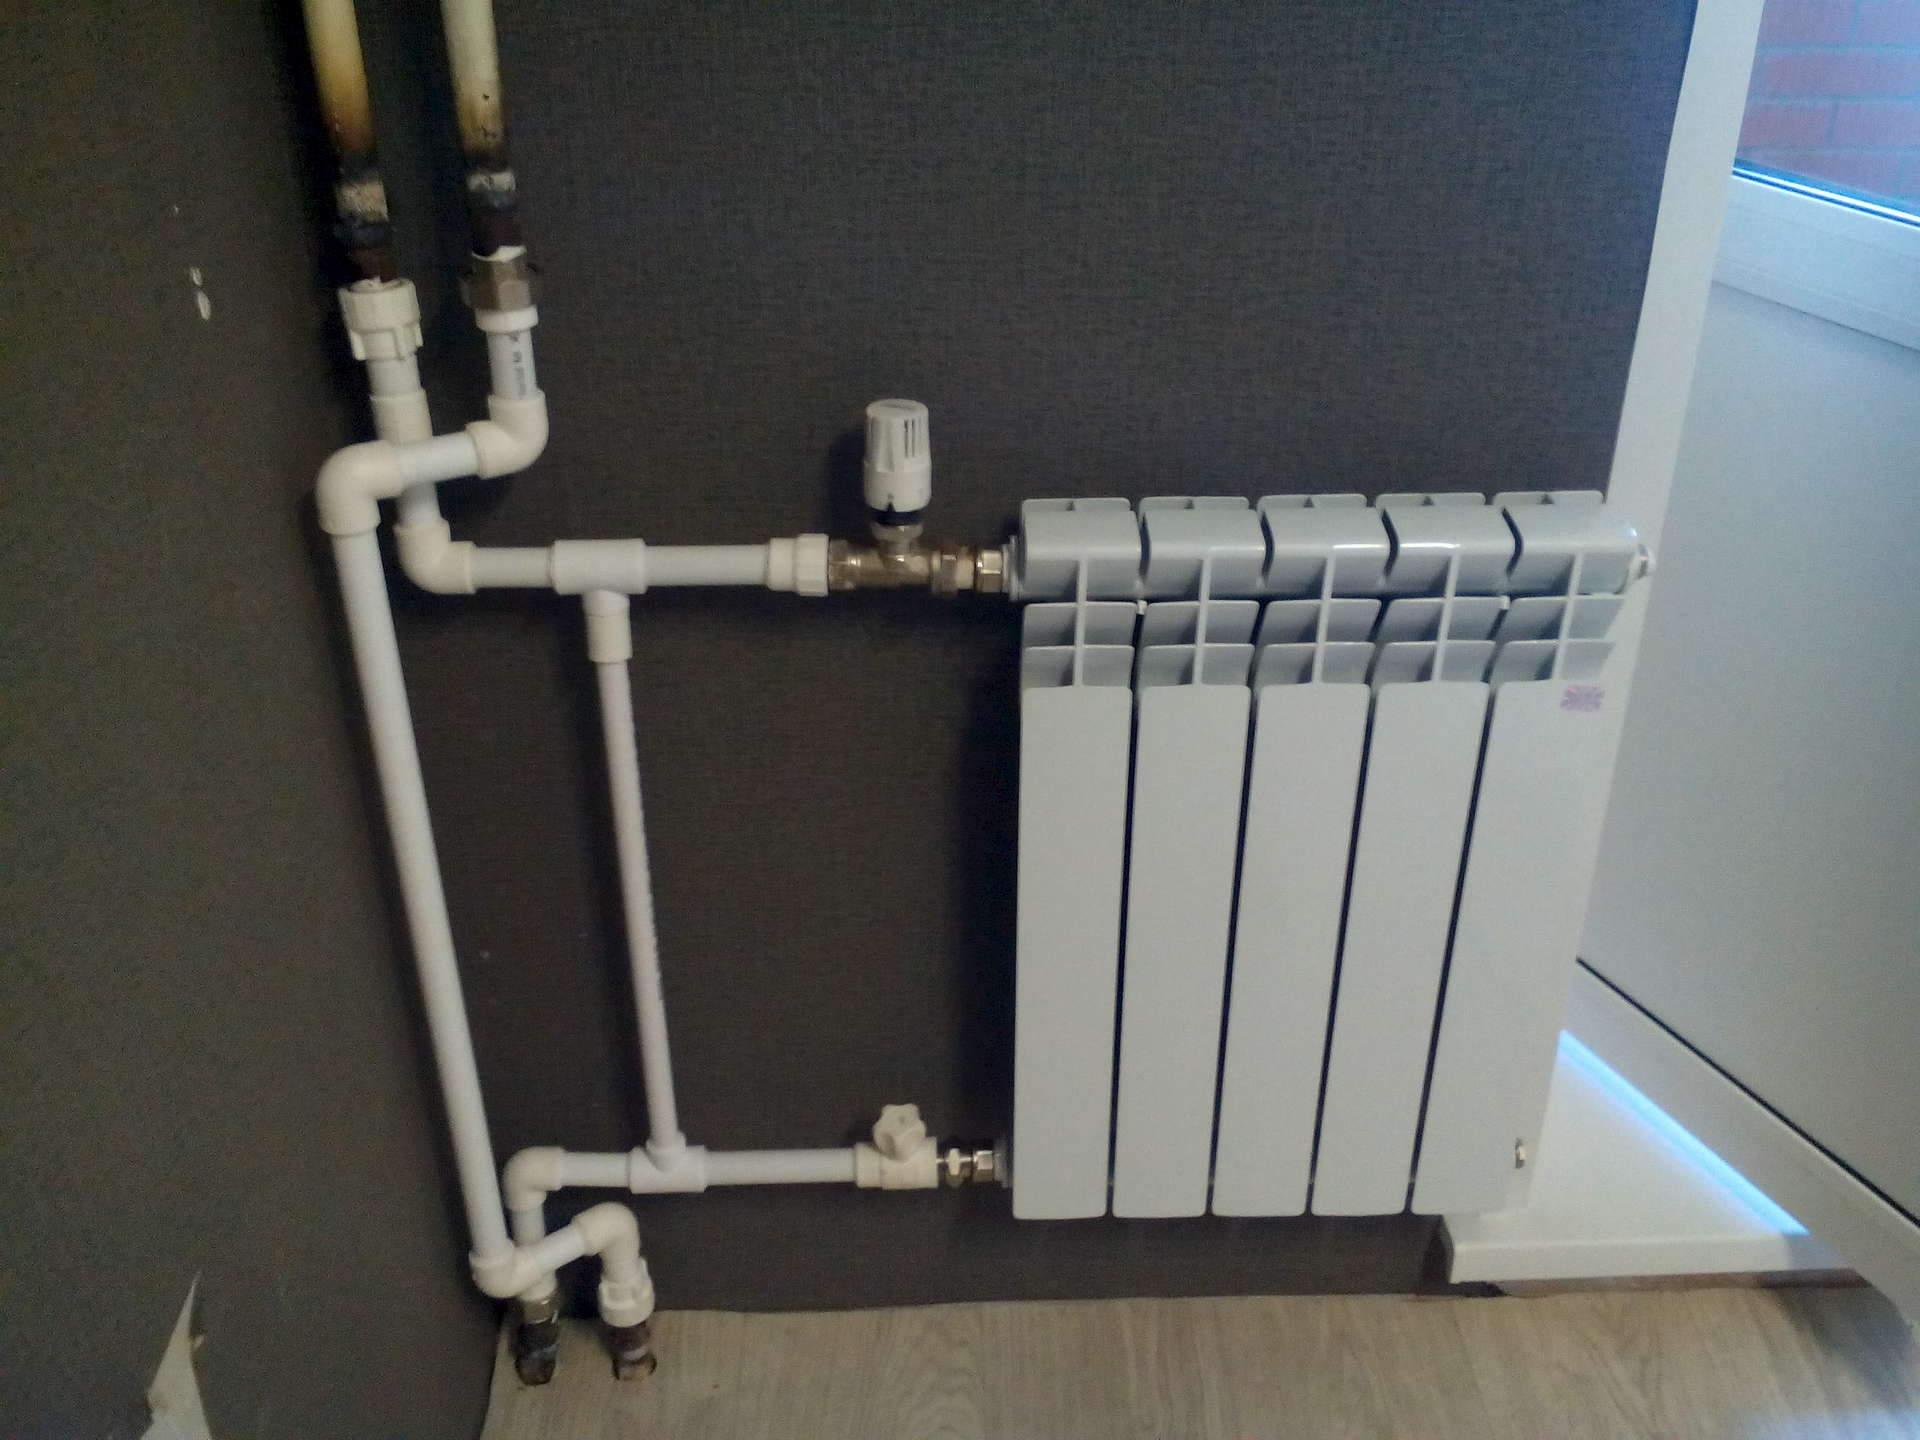 Замена батарей отопления в квартире своими руками Строй 35